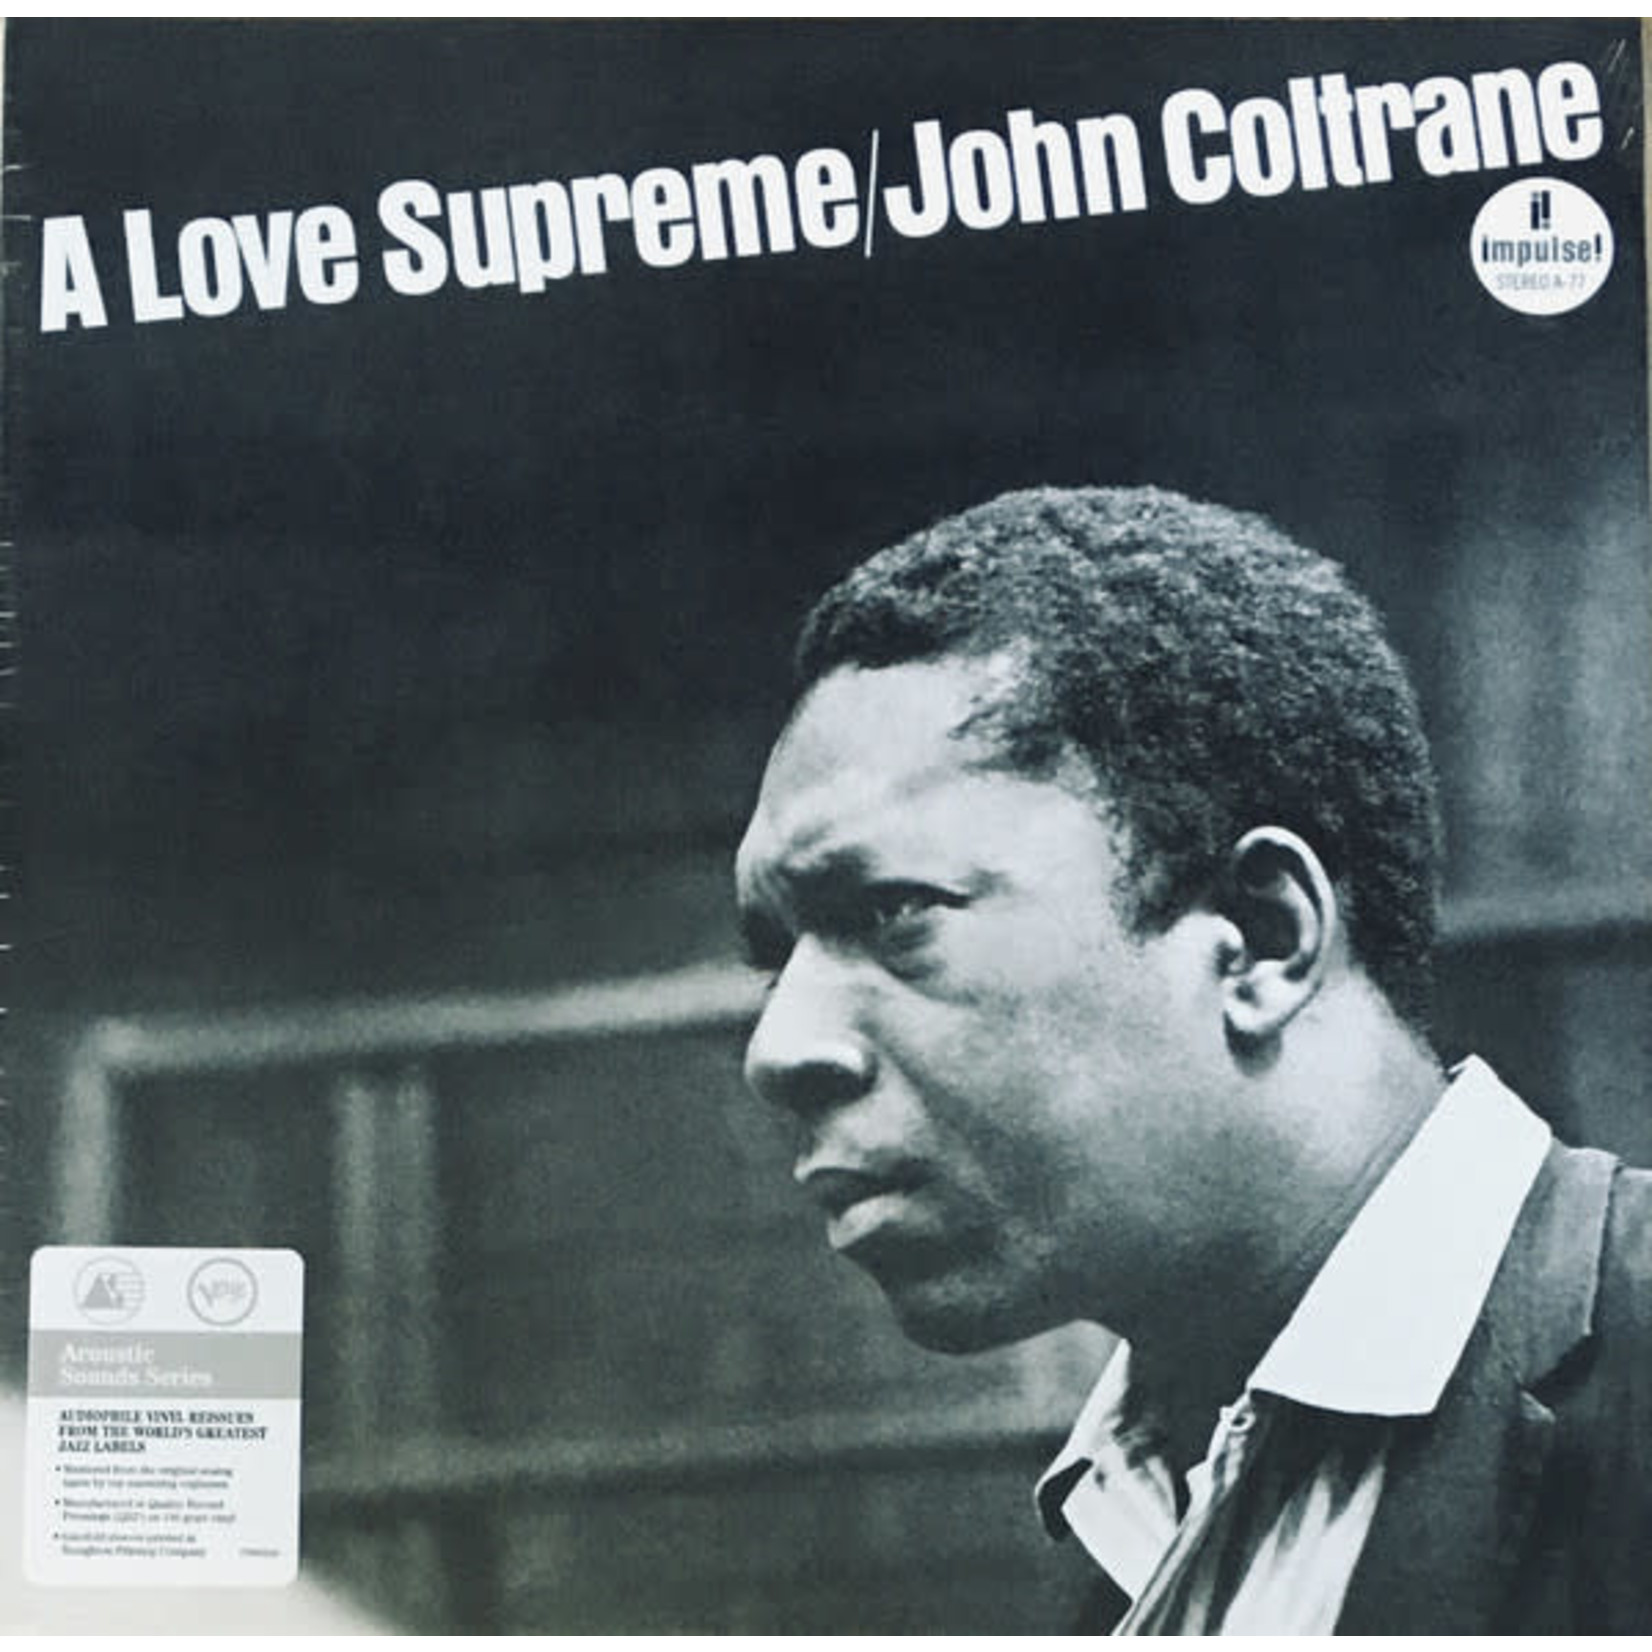 JOHN COLTRANE A LOVE SUPREME (LP) RM 180G IMPULSE